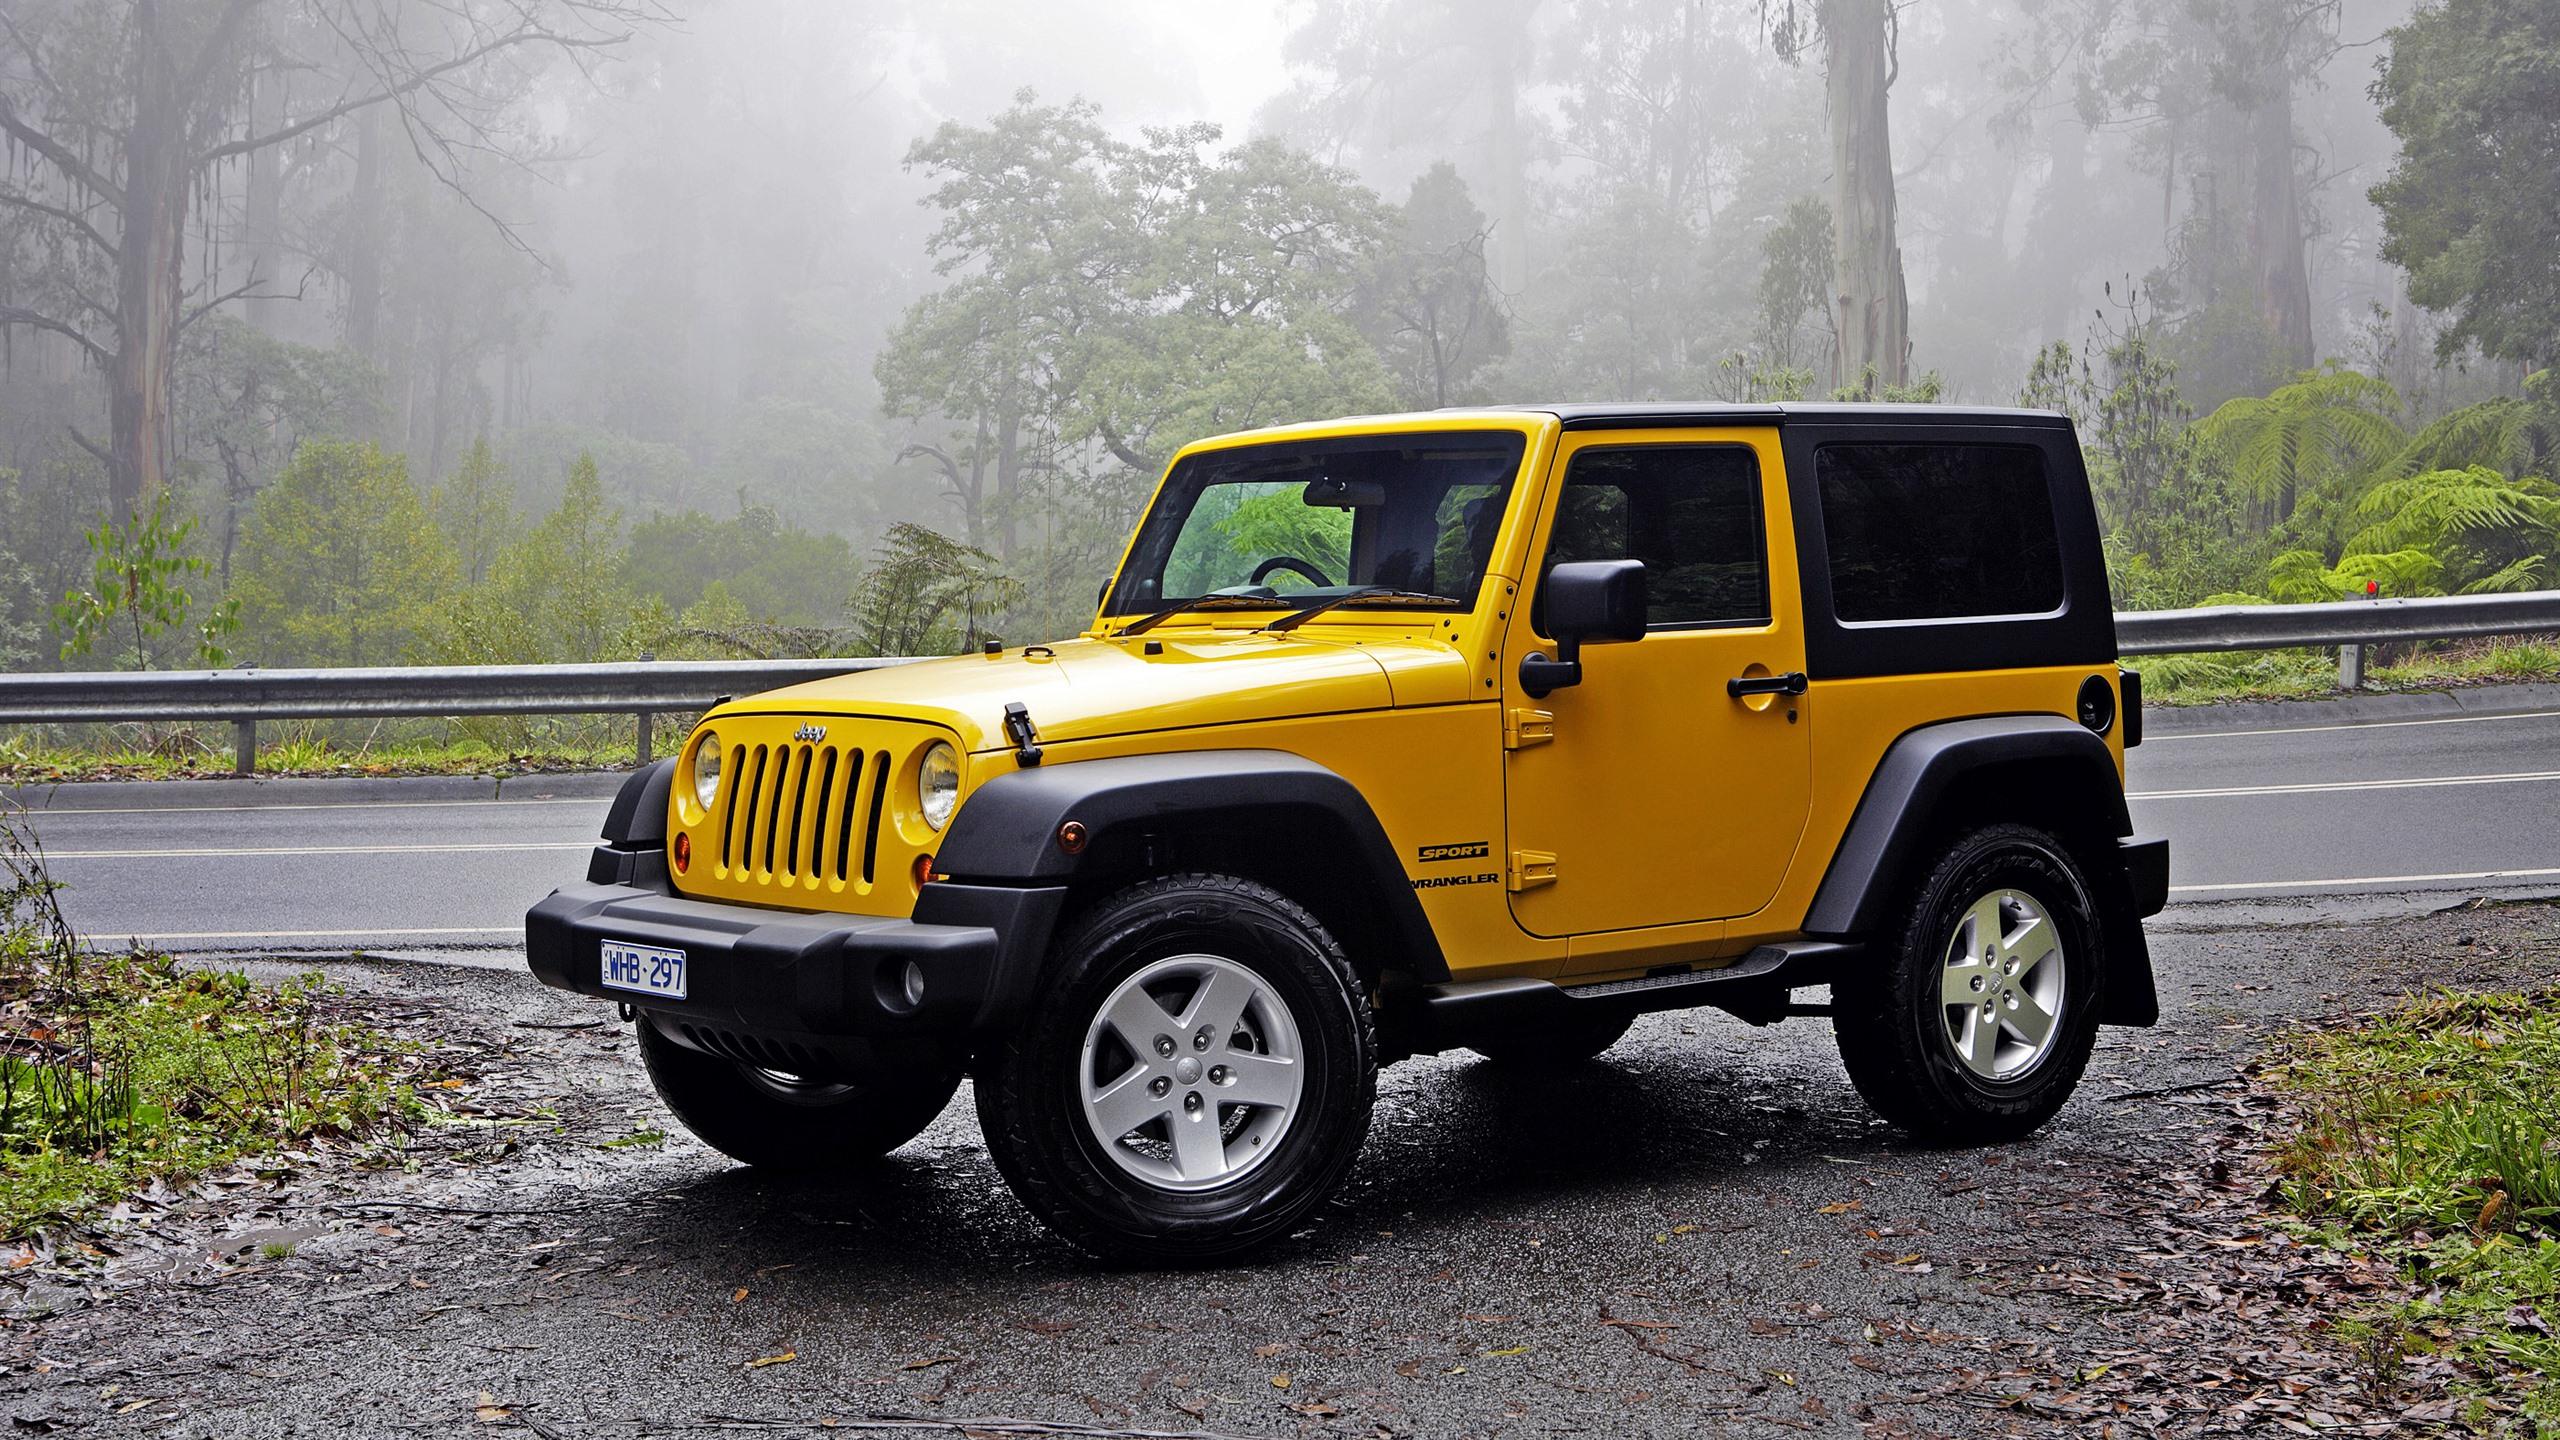 Yellow Jeep 2 Door 2560x1440 Wallpaper Teahub Io